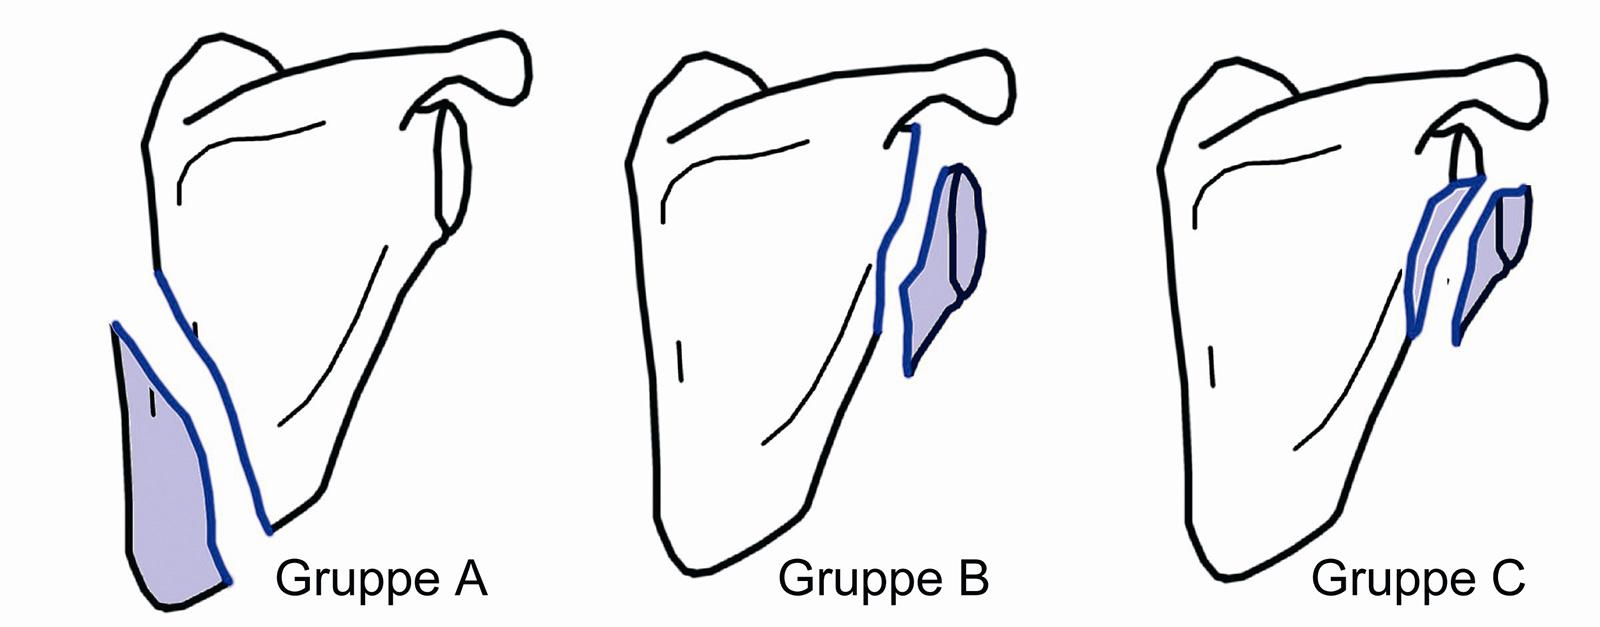 Abb. 3-62: Habermeyer -Klassifikation